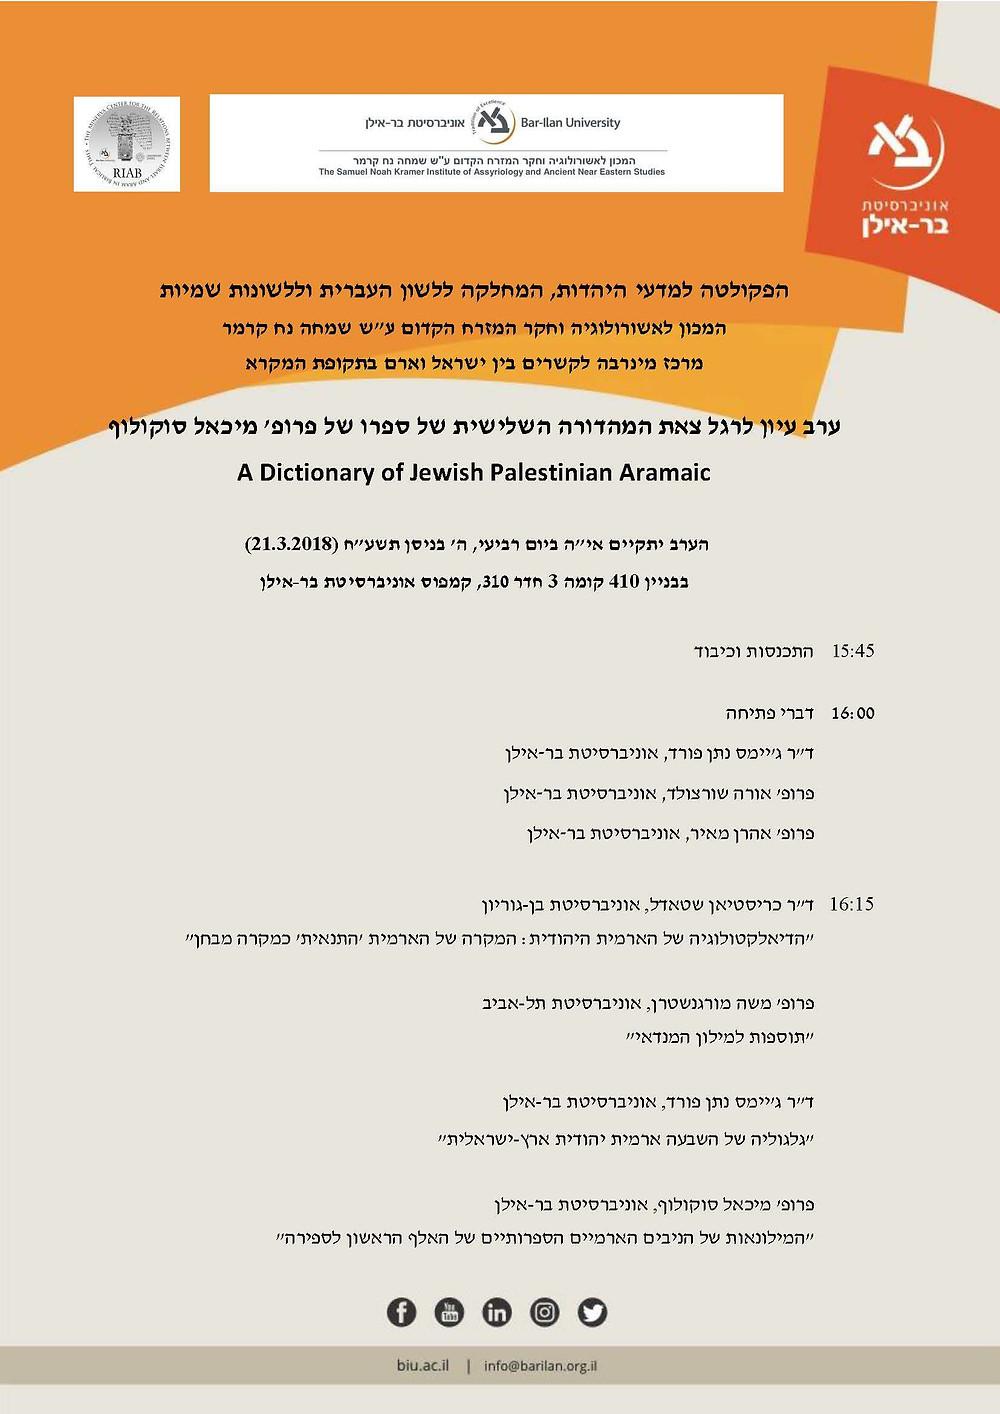 Invitation to Sokoloff event